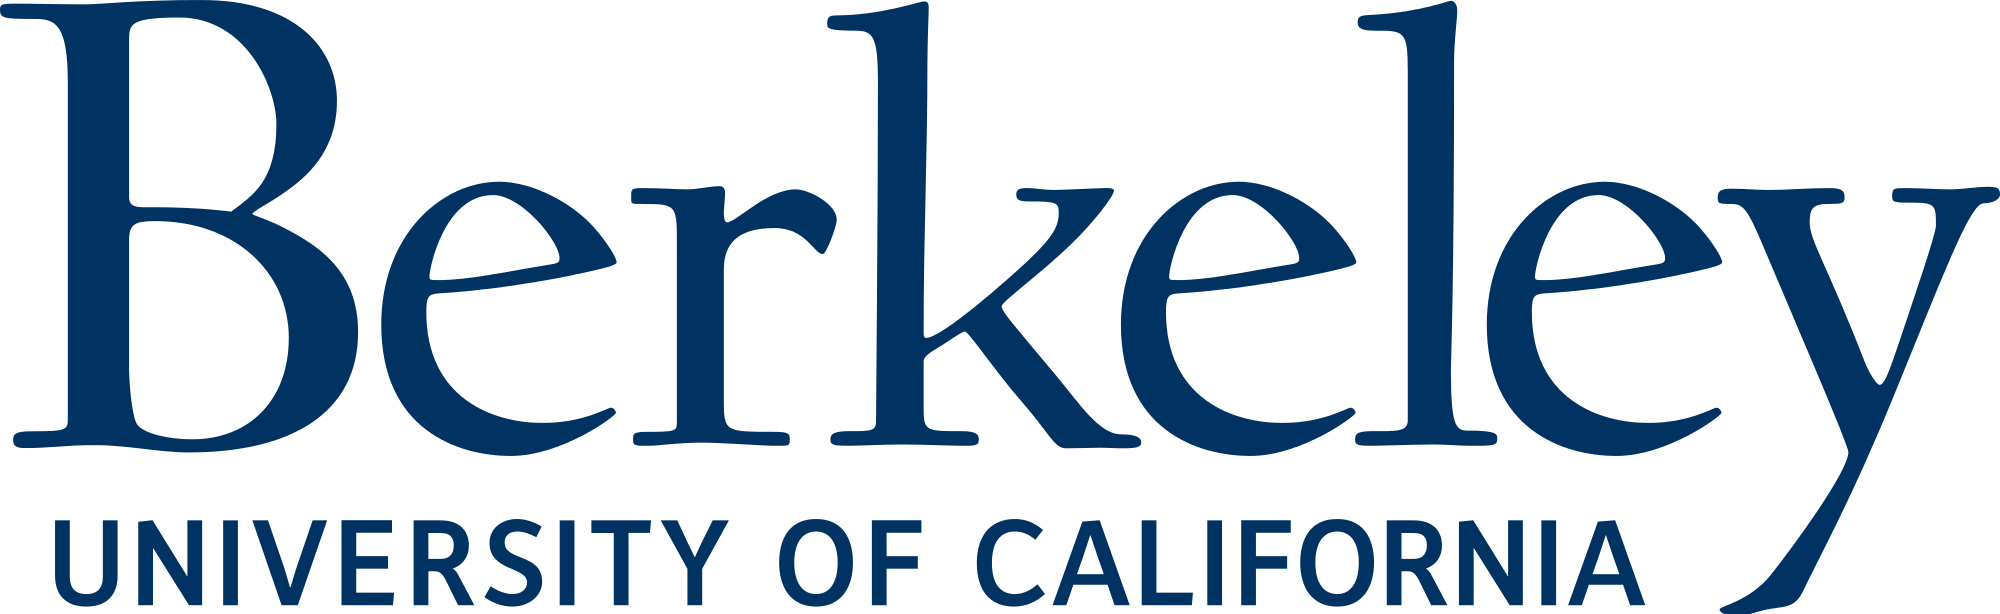 Graffiti-Artists-for-Hire-University-of-California-Berkeley2.png